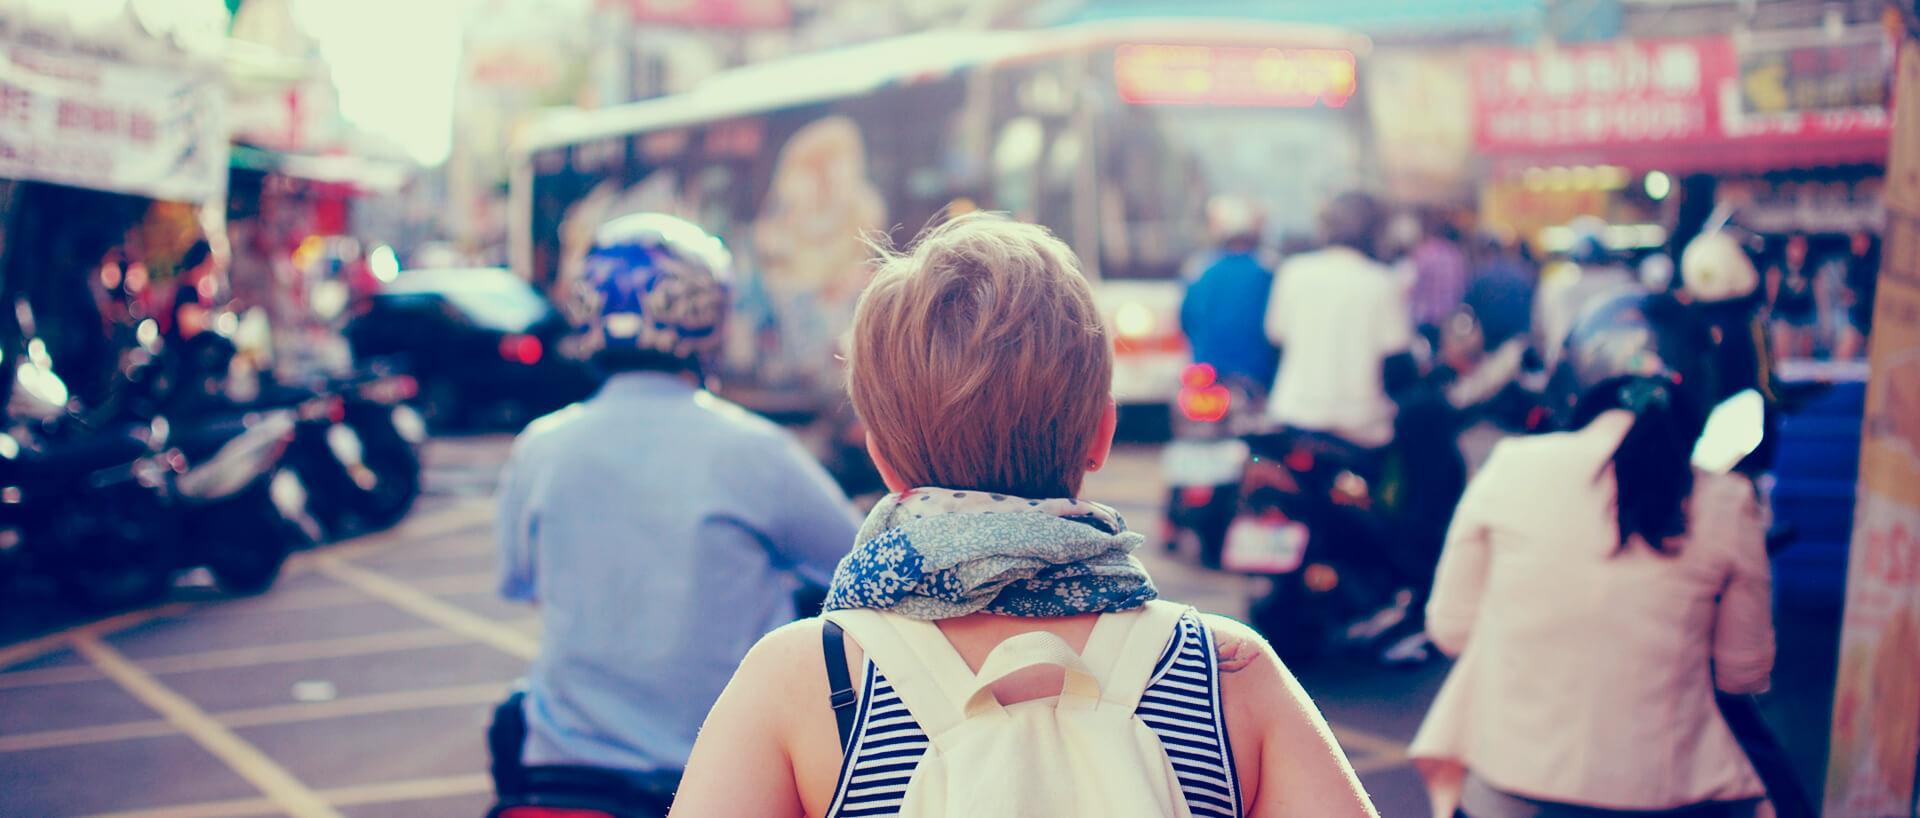 tourist backpacker walking through a busy street